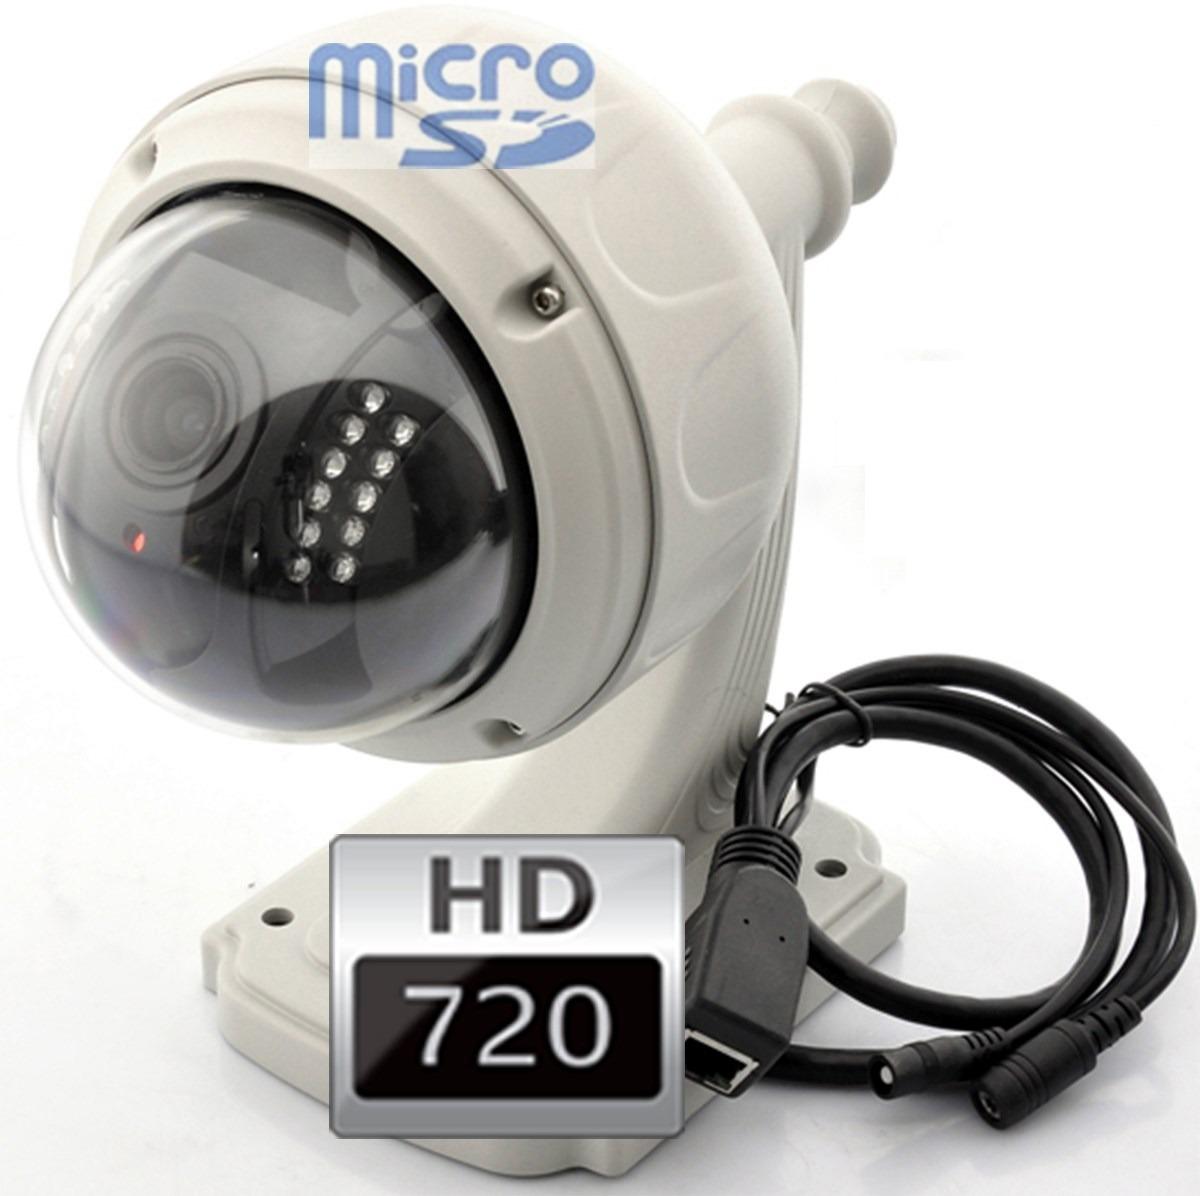 Camara de vigilancia exterior camara de vigilancia - Camaras de vigilancia ip wifi ...